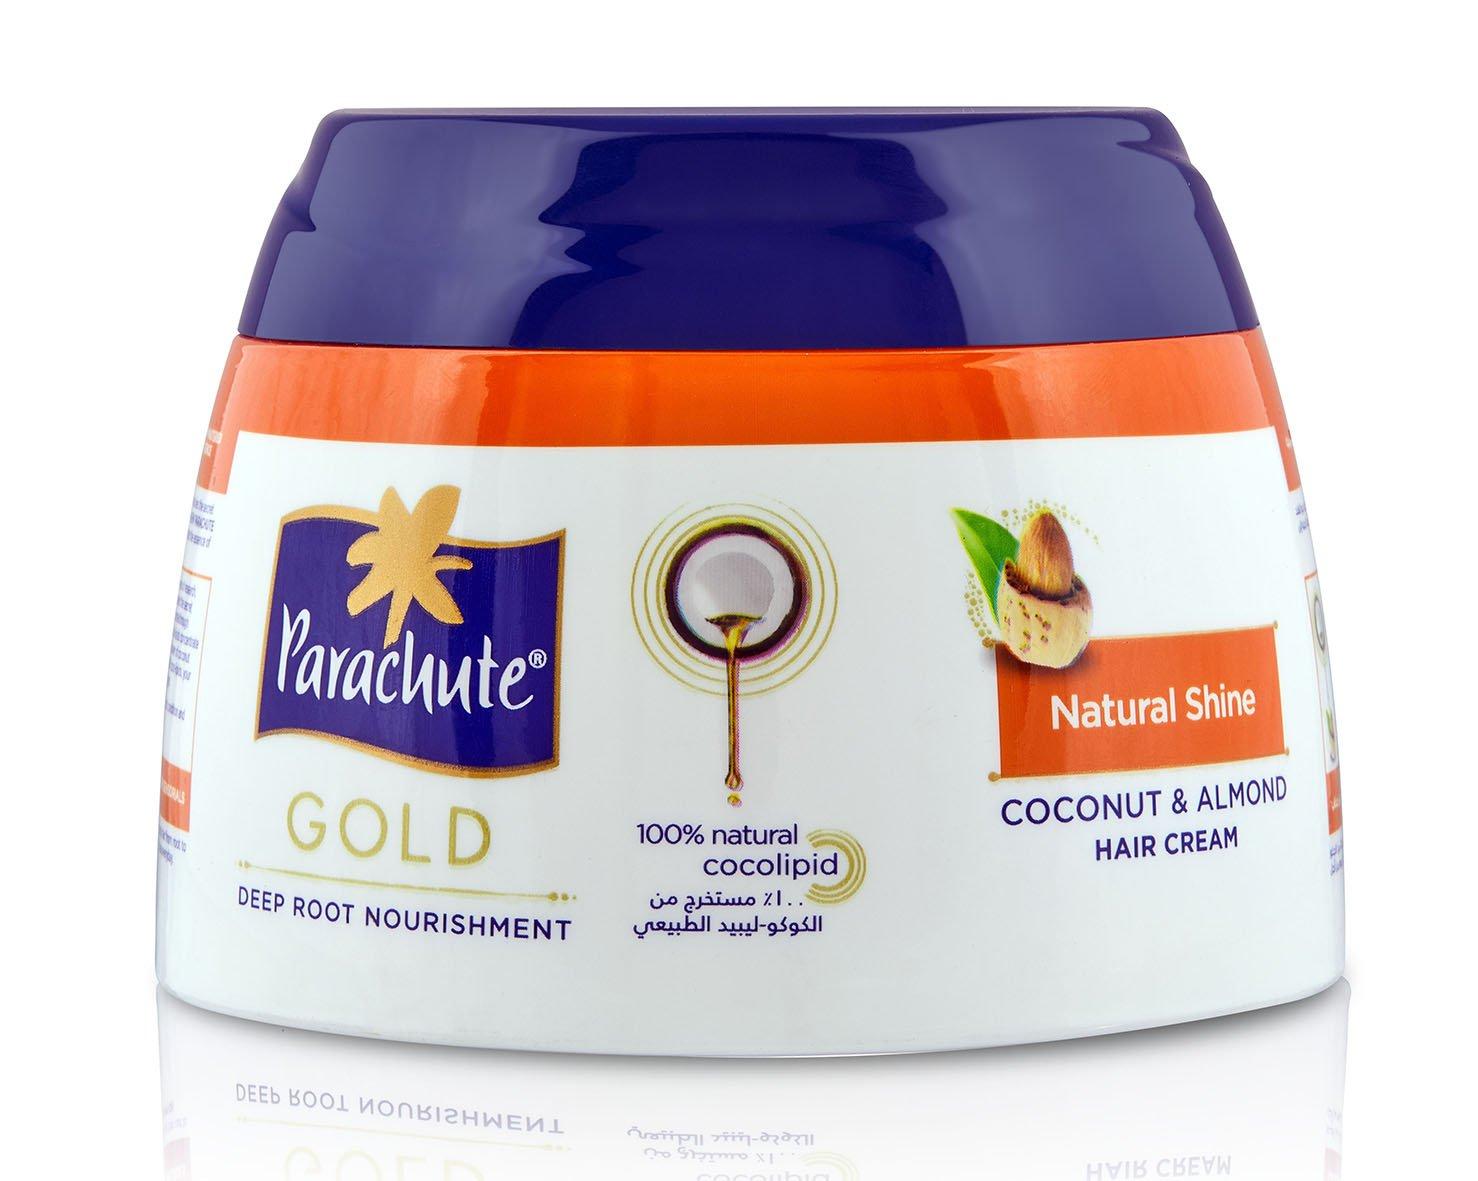 317f2cde52ca Amazon.com   Parachute Gold Hair Cream Natural Shine - 4.7 fl.oz. (140ml) -  Contains Almond And Coconut   Beauty